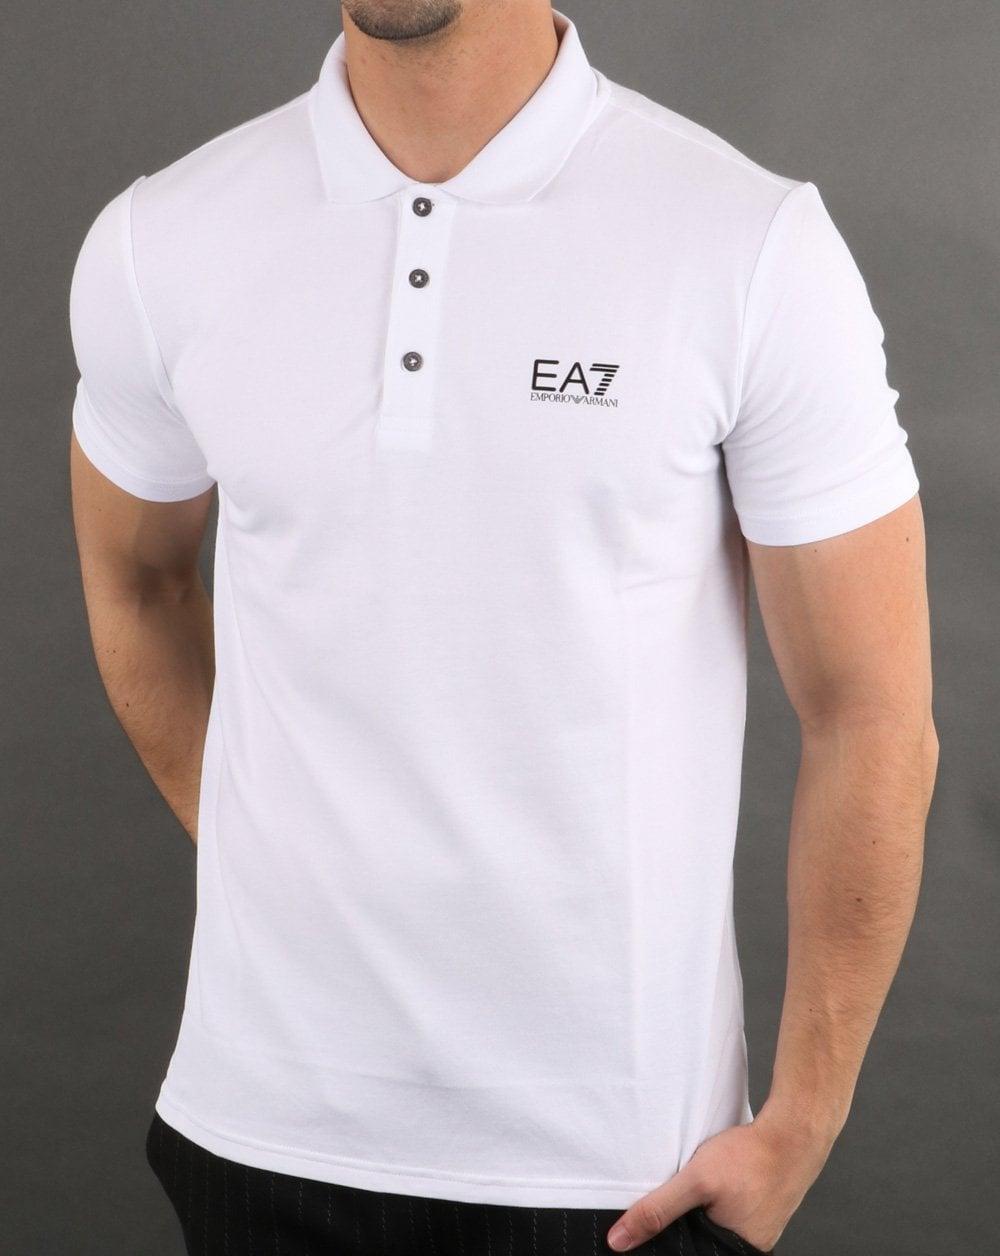 06b29f9f Emporio Armani EA7 Emporio Armani EA7 Core Logo Pique Polo Shirt White